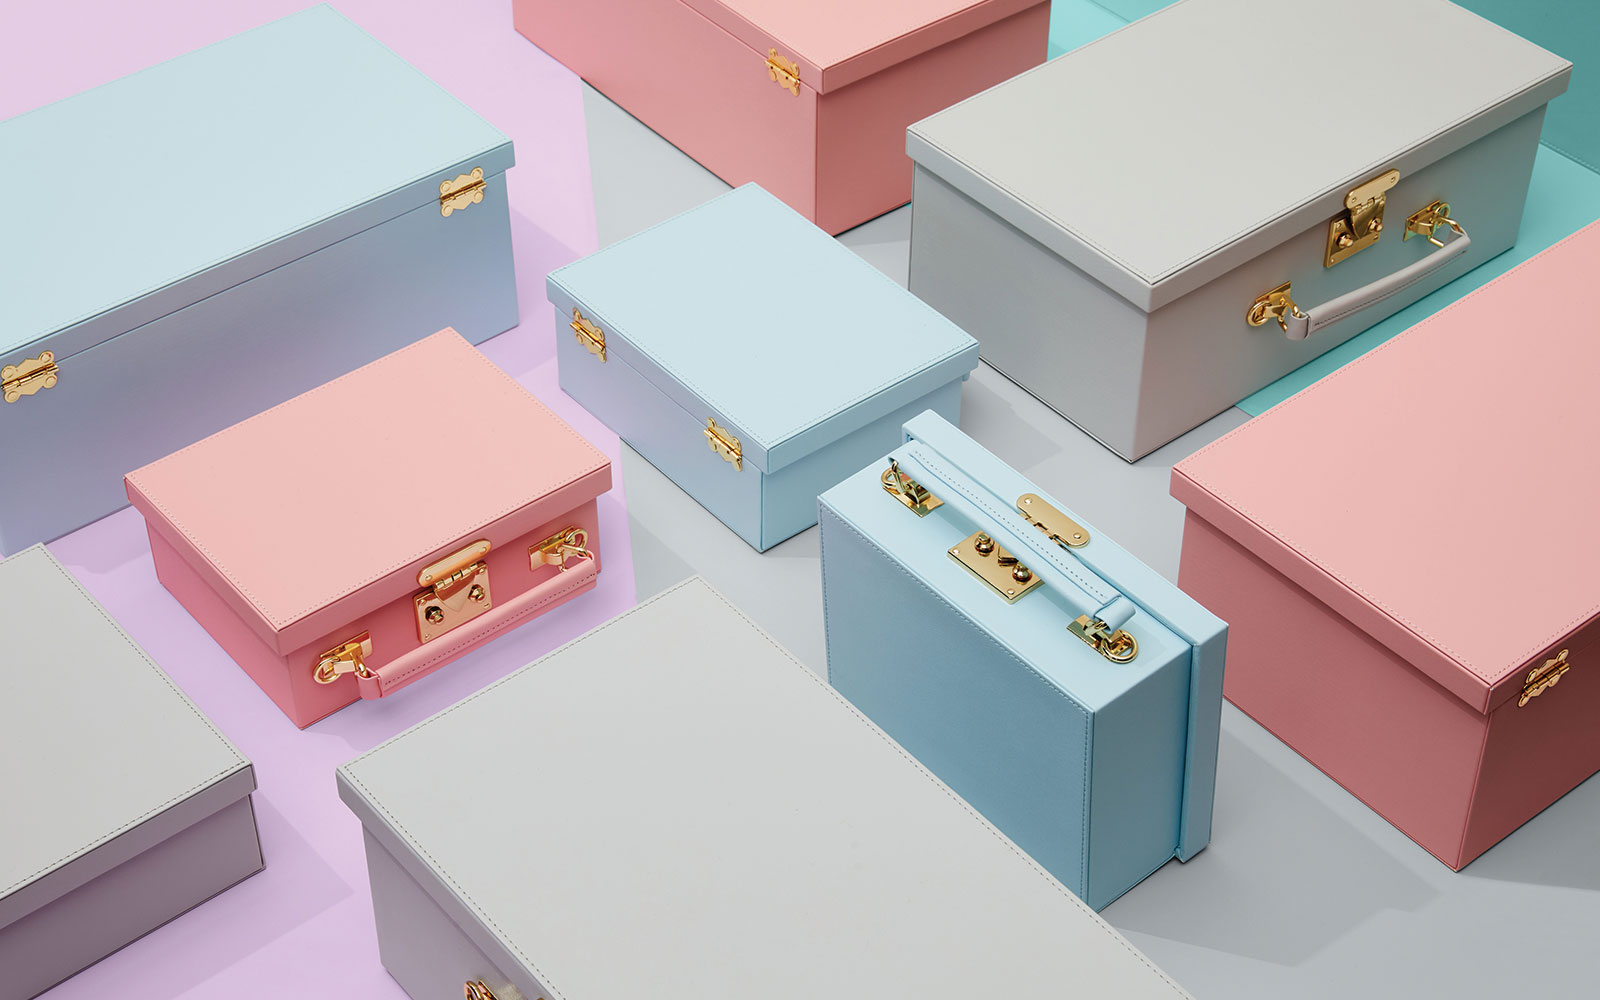 Melb. Design Co Wooden Toys